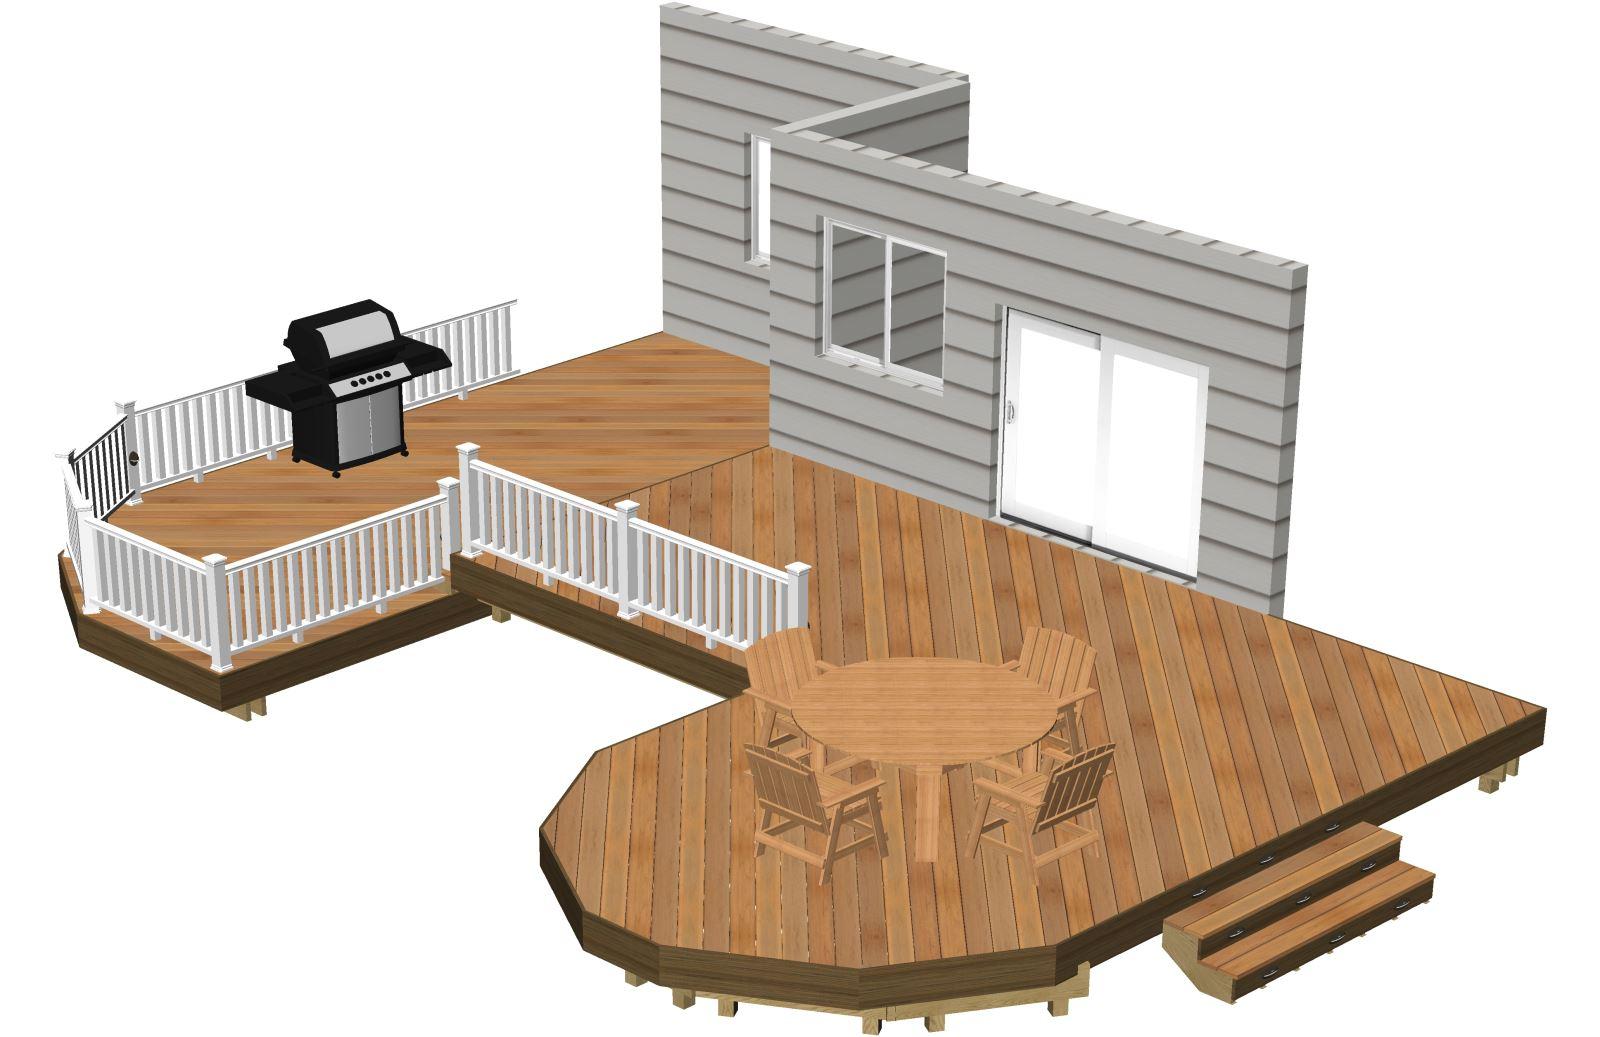 Patio Plans For Inspiration: TimberTech Australia